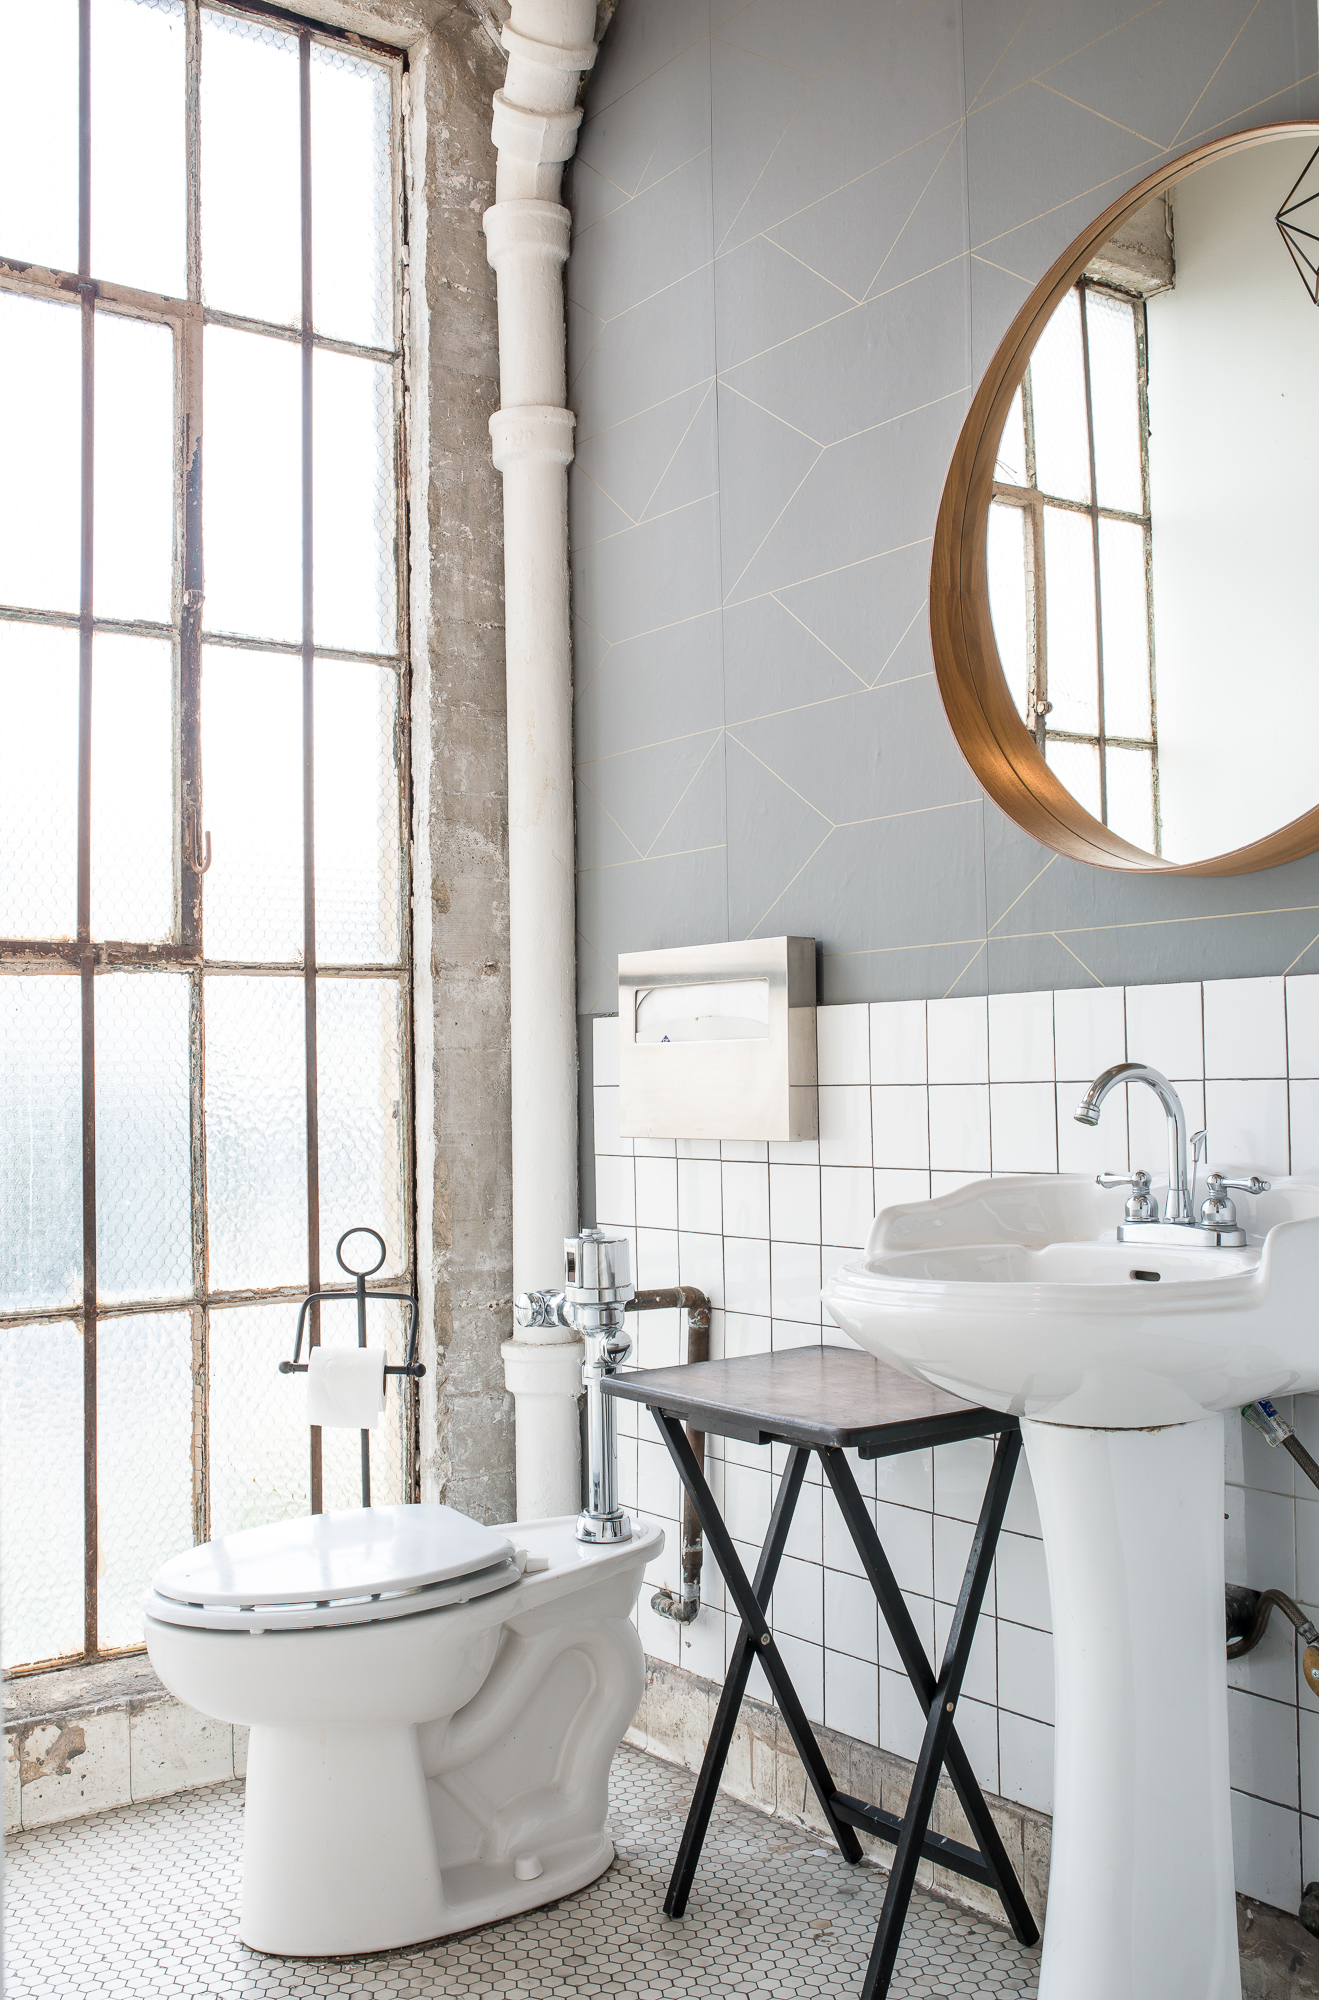 GreyLoftbathroom.jpg